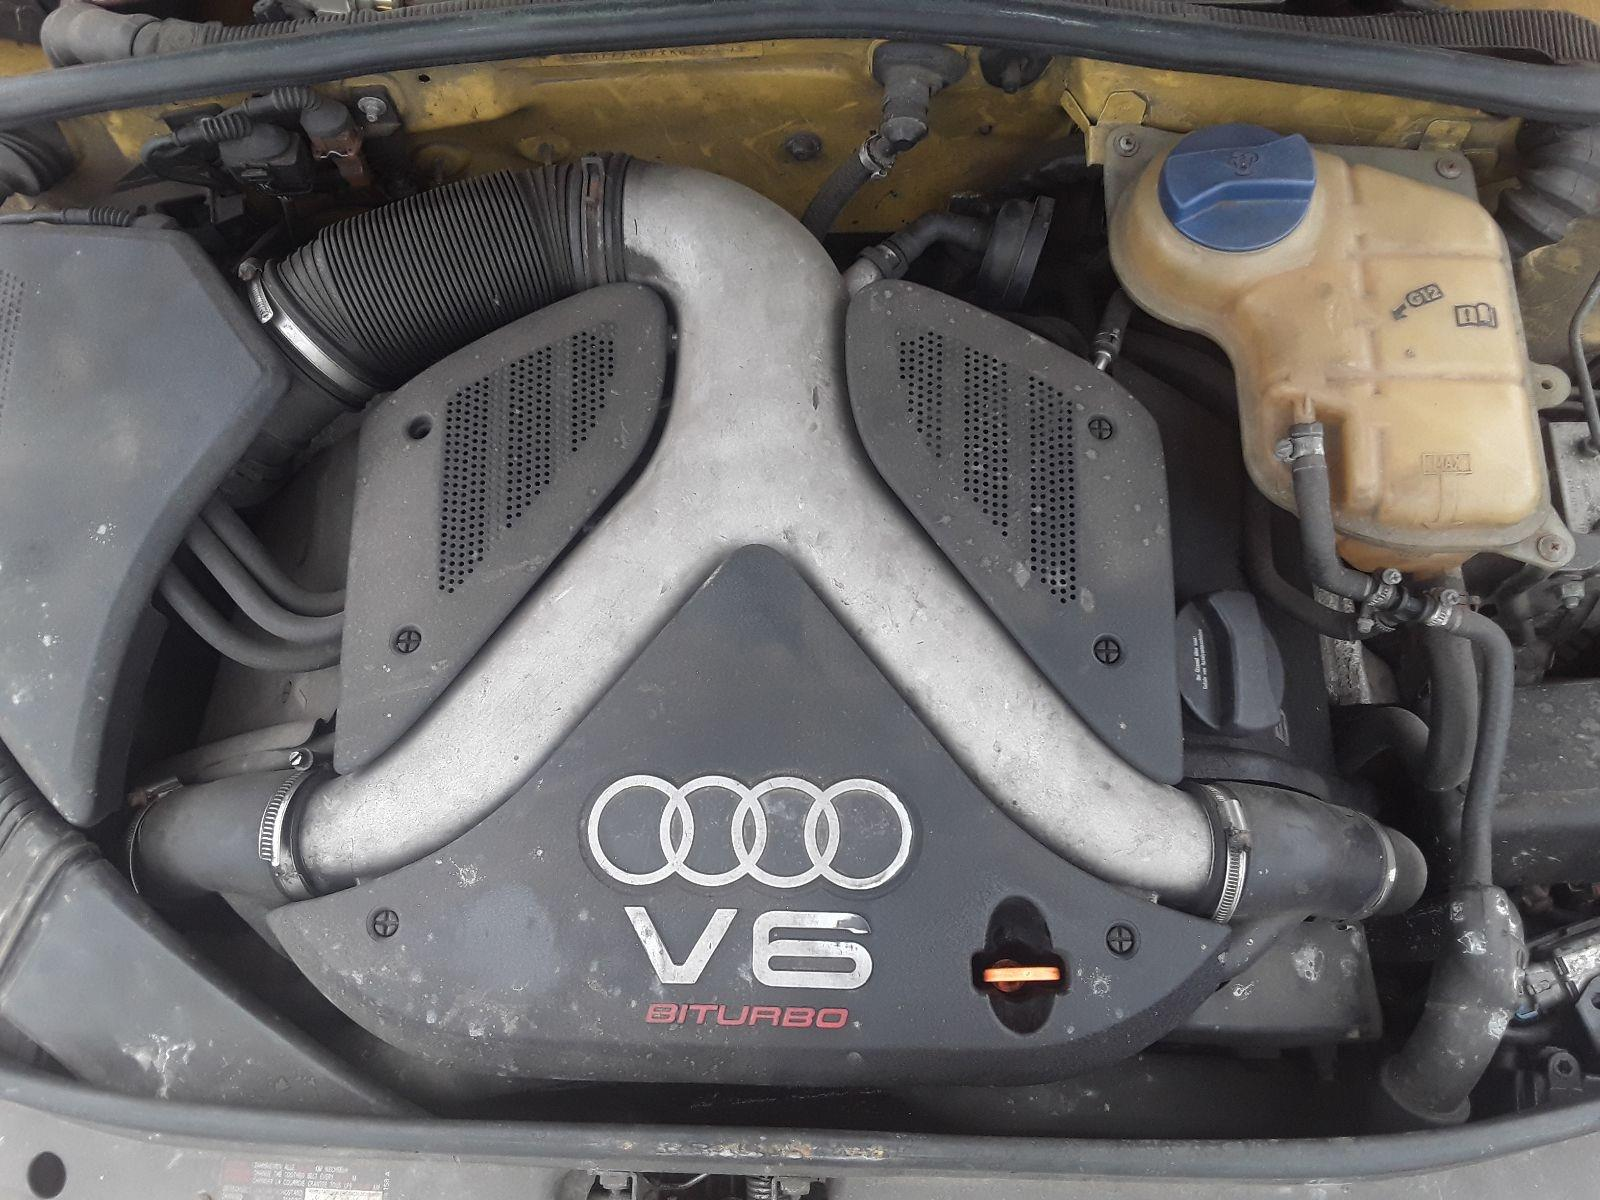 hight resolution of engine audi a4 1995 2000 s4 quattro 4wd 2 7 265bhp petrol manual agb 11146736